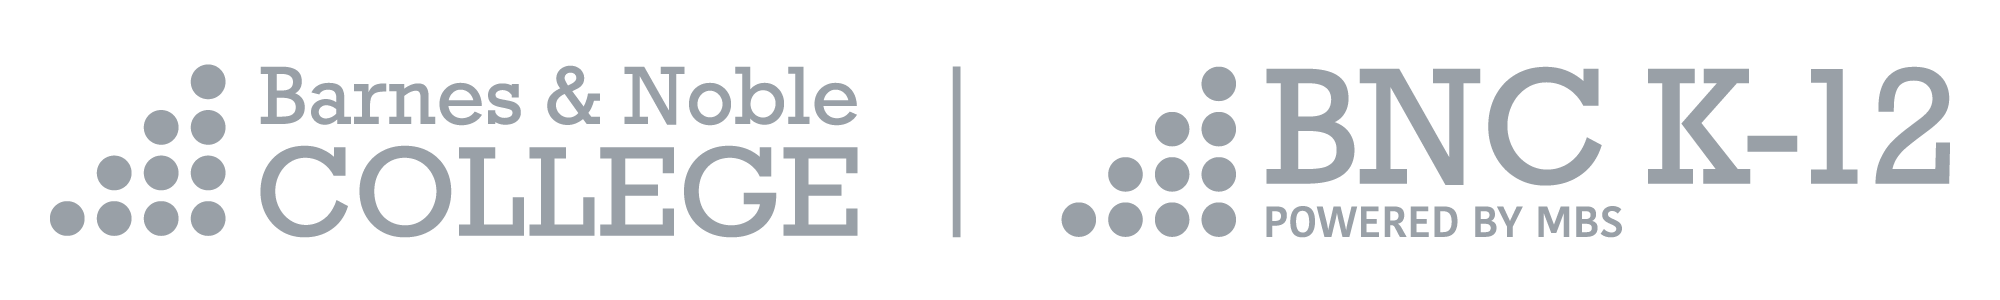 bnc-services_mpower-logo_191108-v2-LP-footer